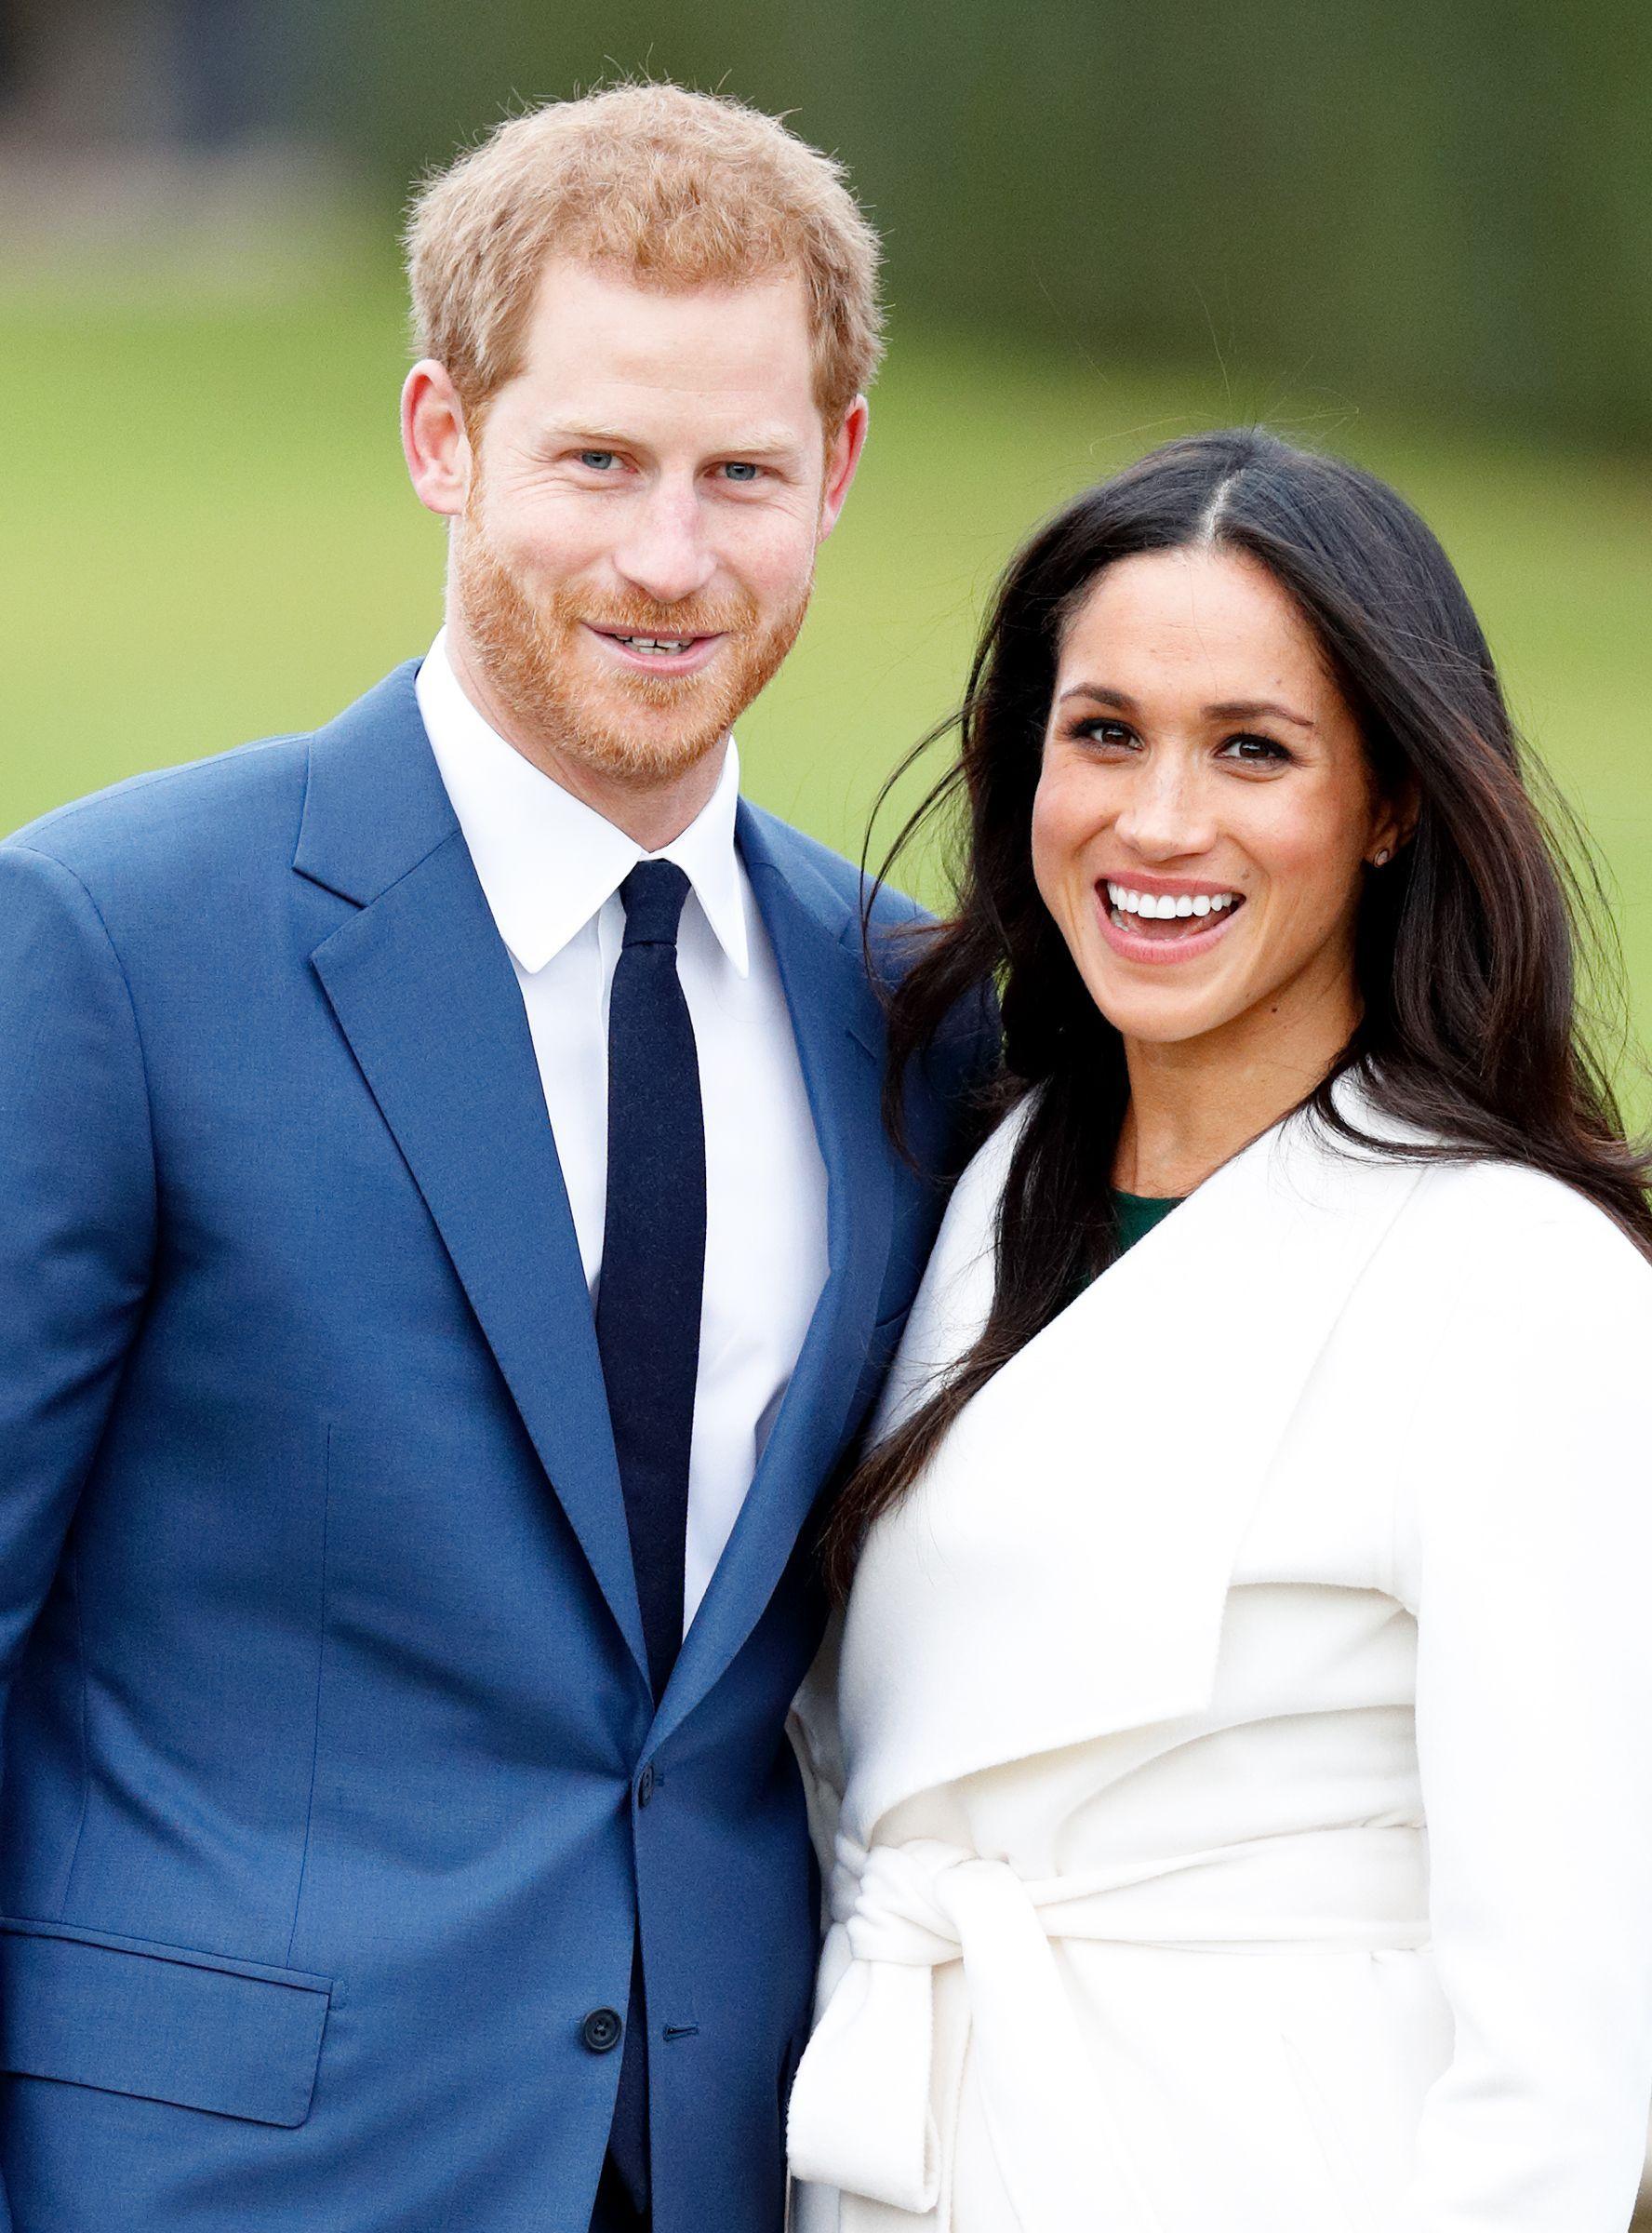 Matrimonio Harry E Meghan : Il principe harry e meghan markle perché è un matrimonio